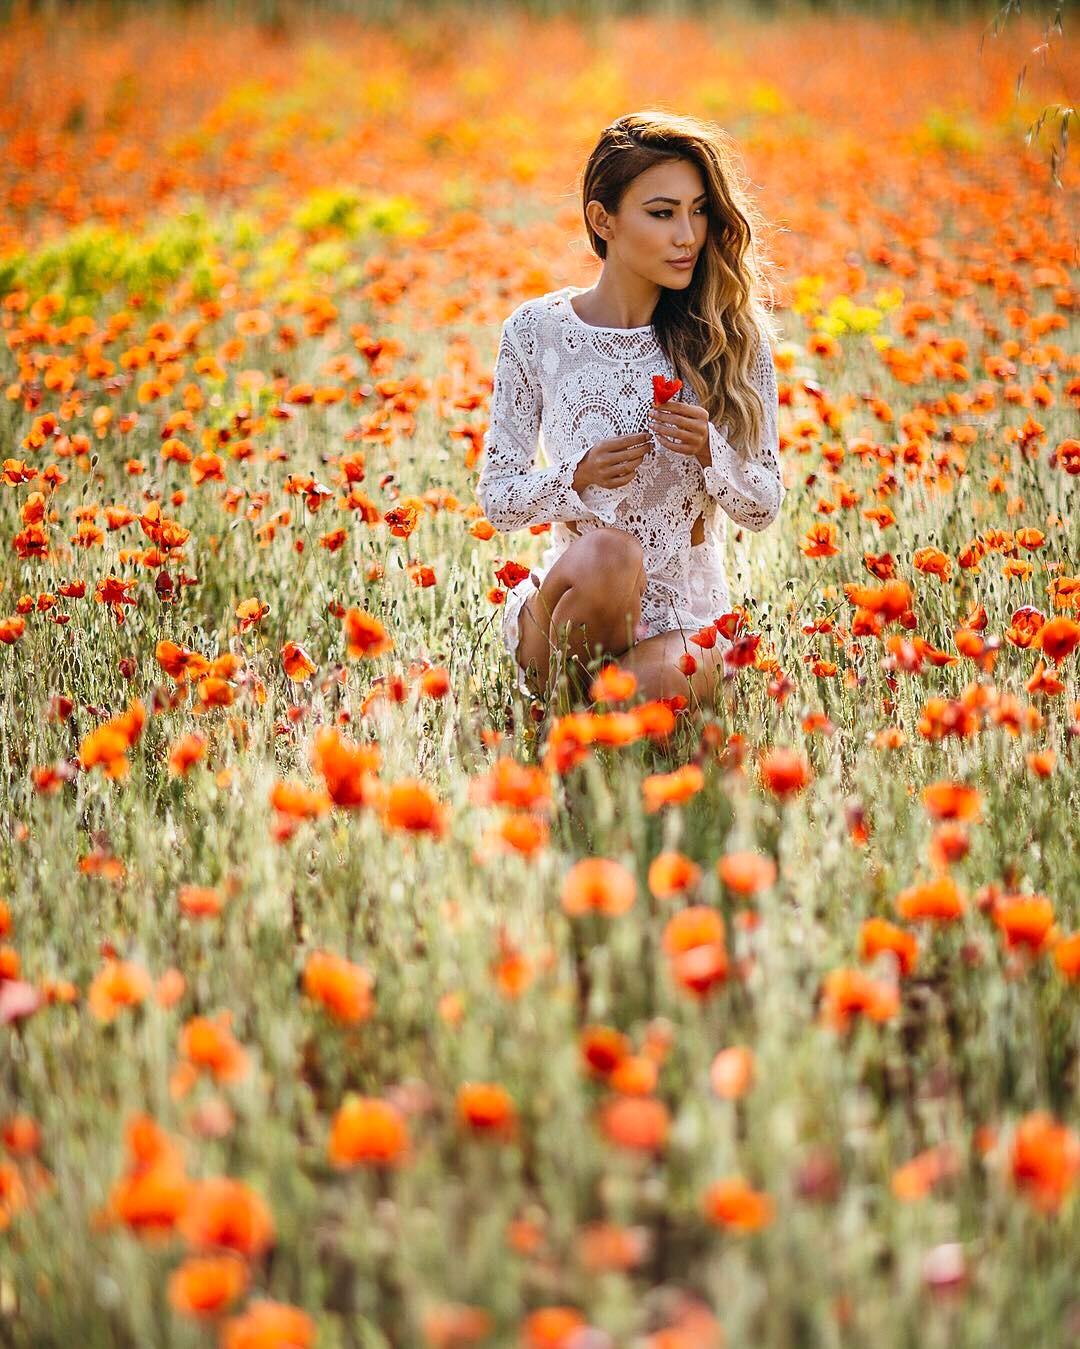 best flower fields of instagram, Antelope Valley California Poppy Reserve // Notjessfashion.com